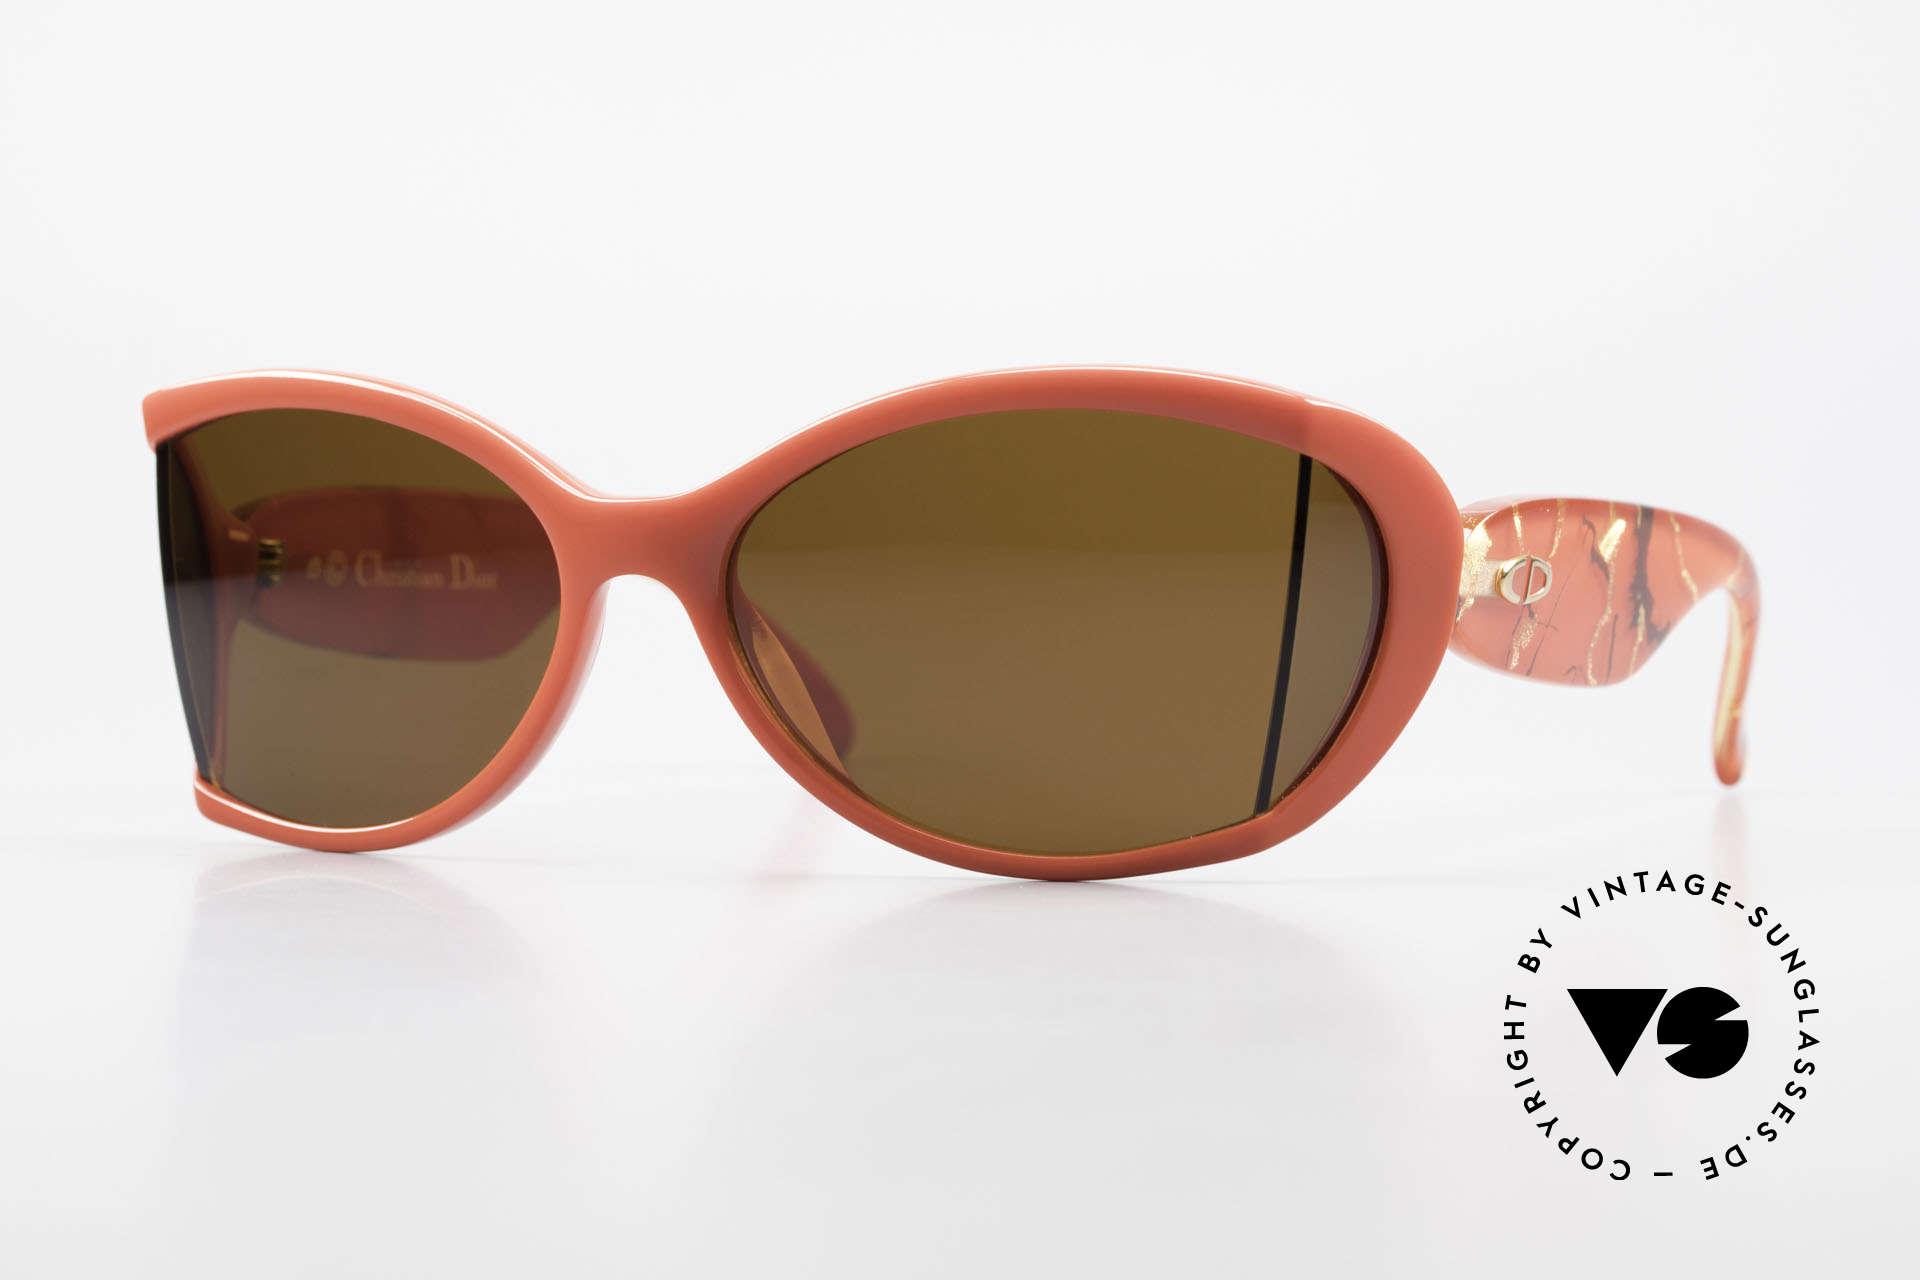 Christian Dior 2439 80's Sunglasses Side Shield, futuristic Christian Dior ladies sunglasses from 1989, Made for Women